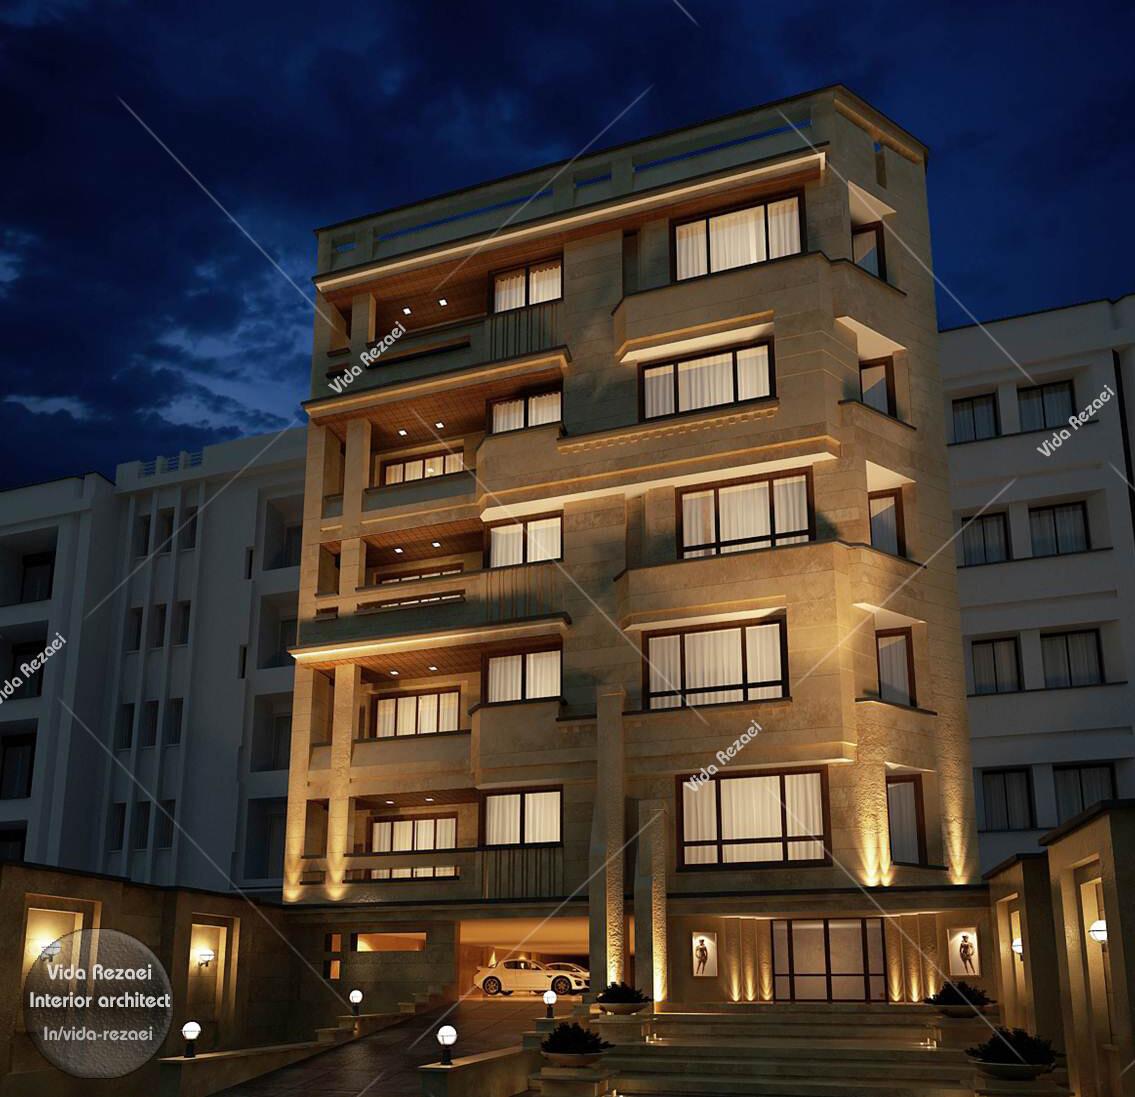 Artstation Facade Of Residential Buildings Vida Rezaei